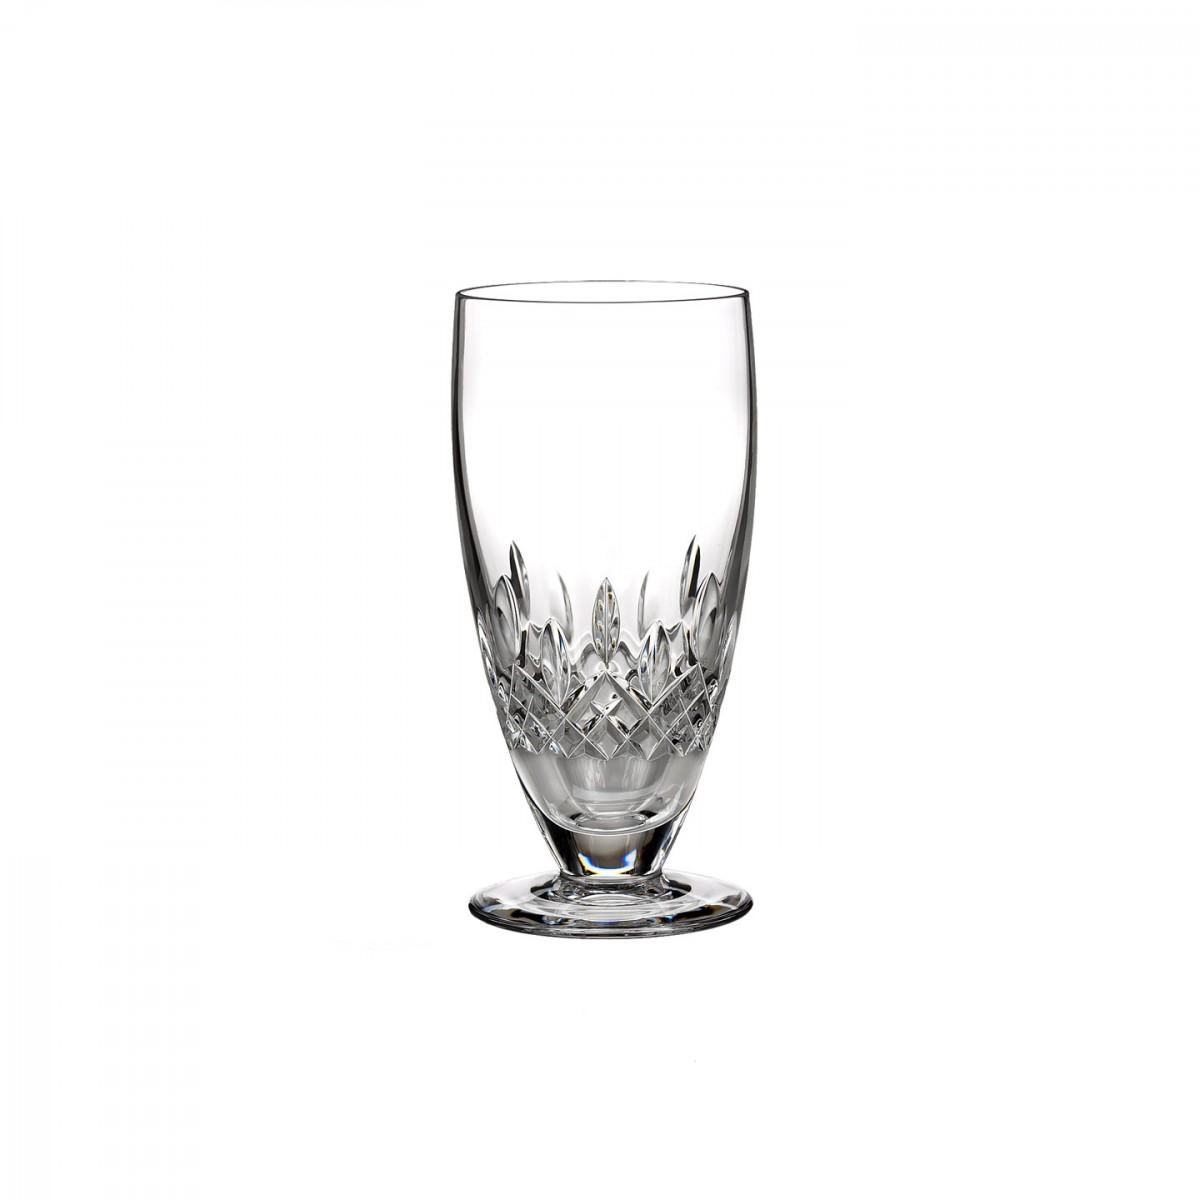 Waterford Crystal, Lismore Encore Crystal Iced Beverage, Single